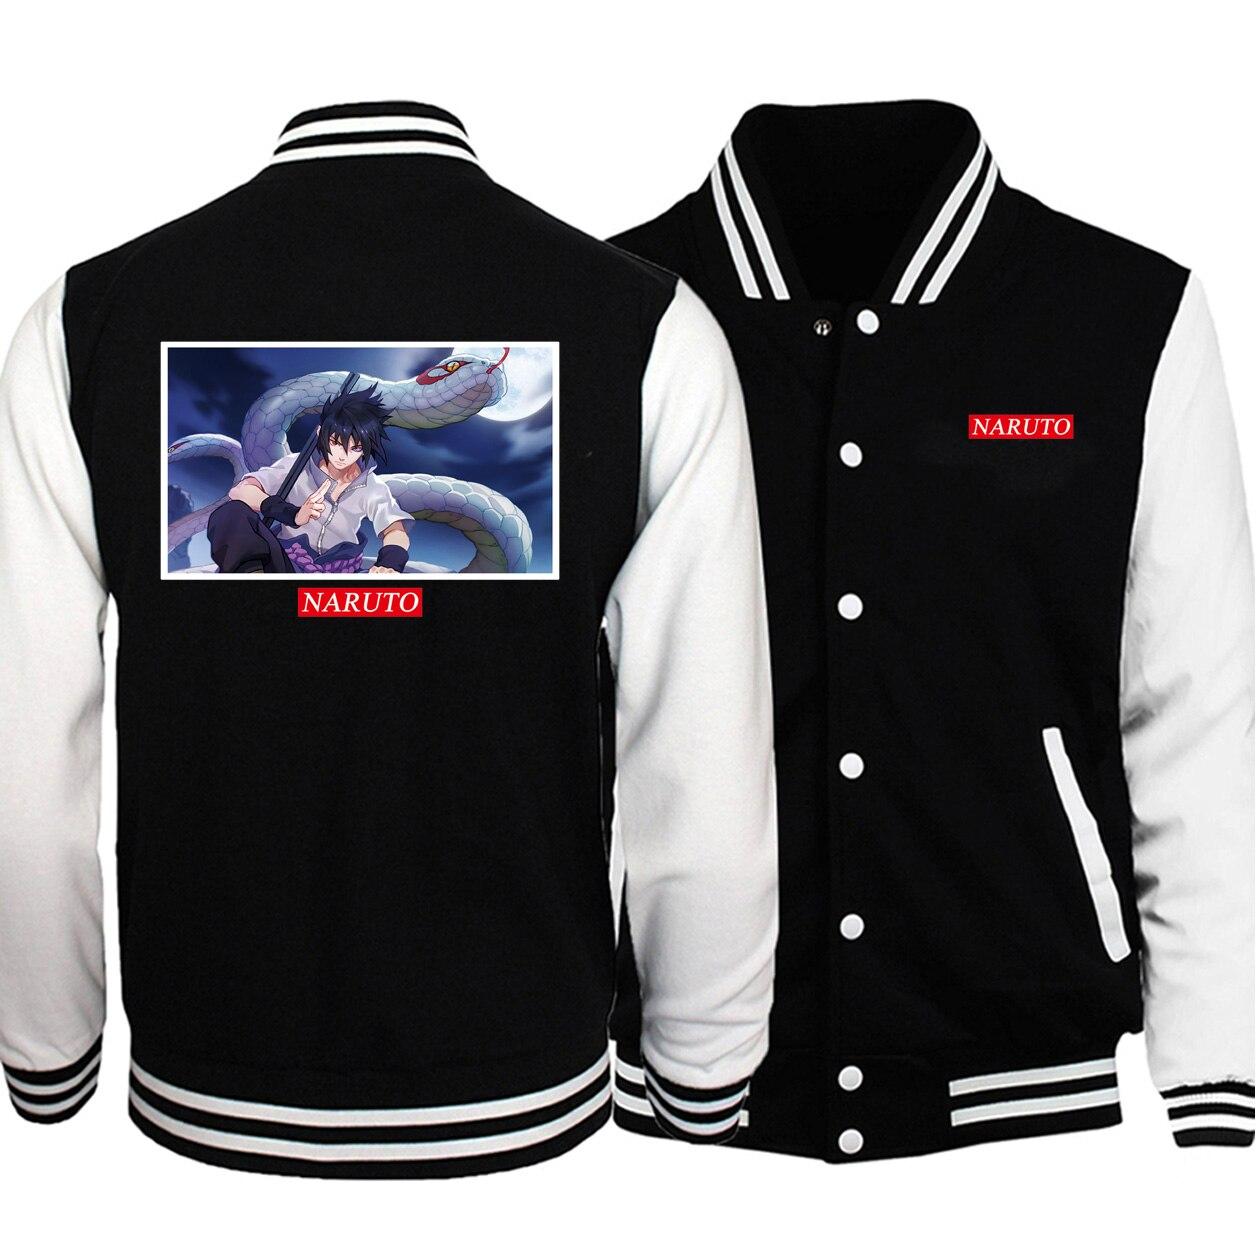 2020 Youthful Naruto Print Men Baseball Jackets Casual Coats Black Plus Velvet Sweatshirt Autumn Winter  Button Man Jackets